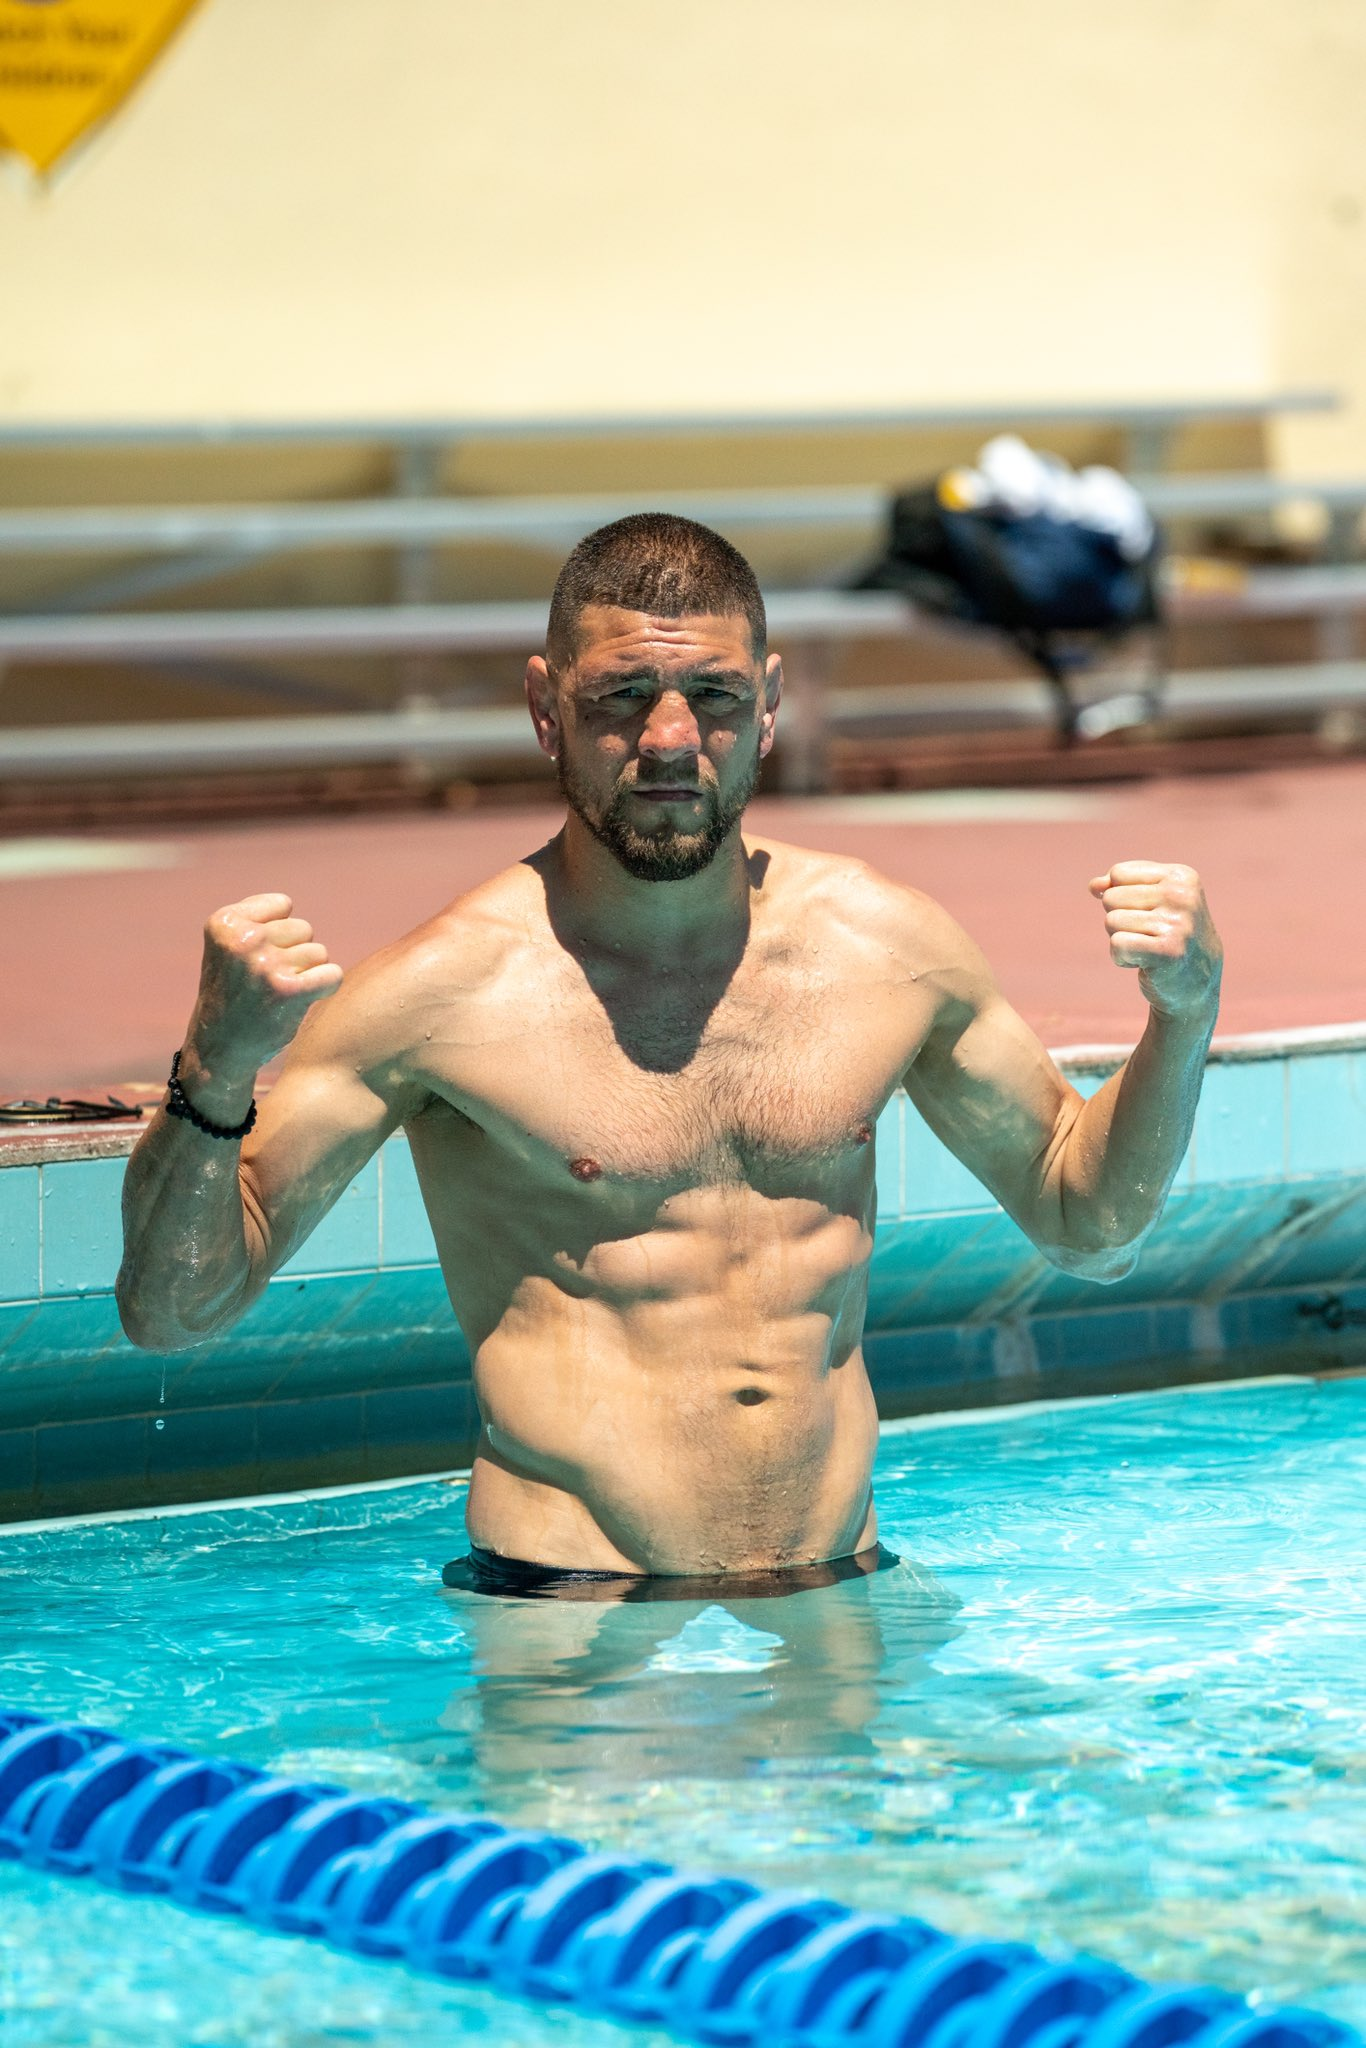 Photos: 37-year-old Nick Diaz showed impressive form